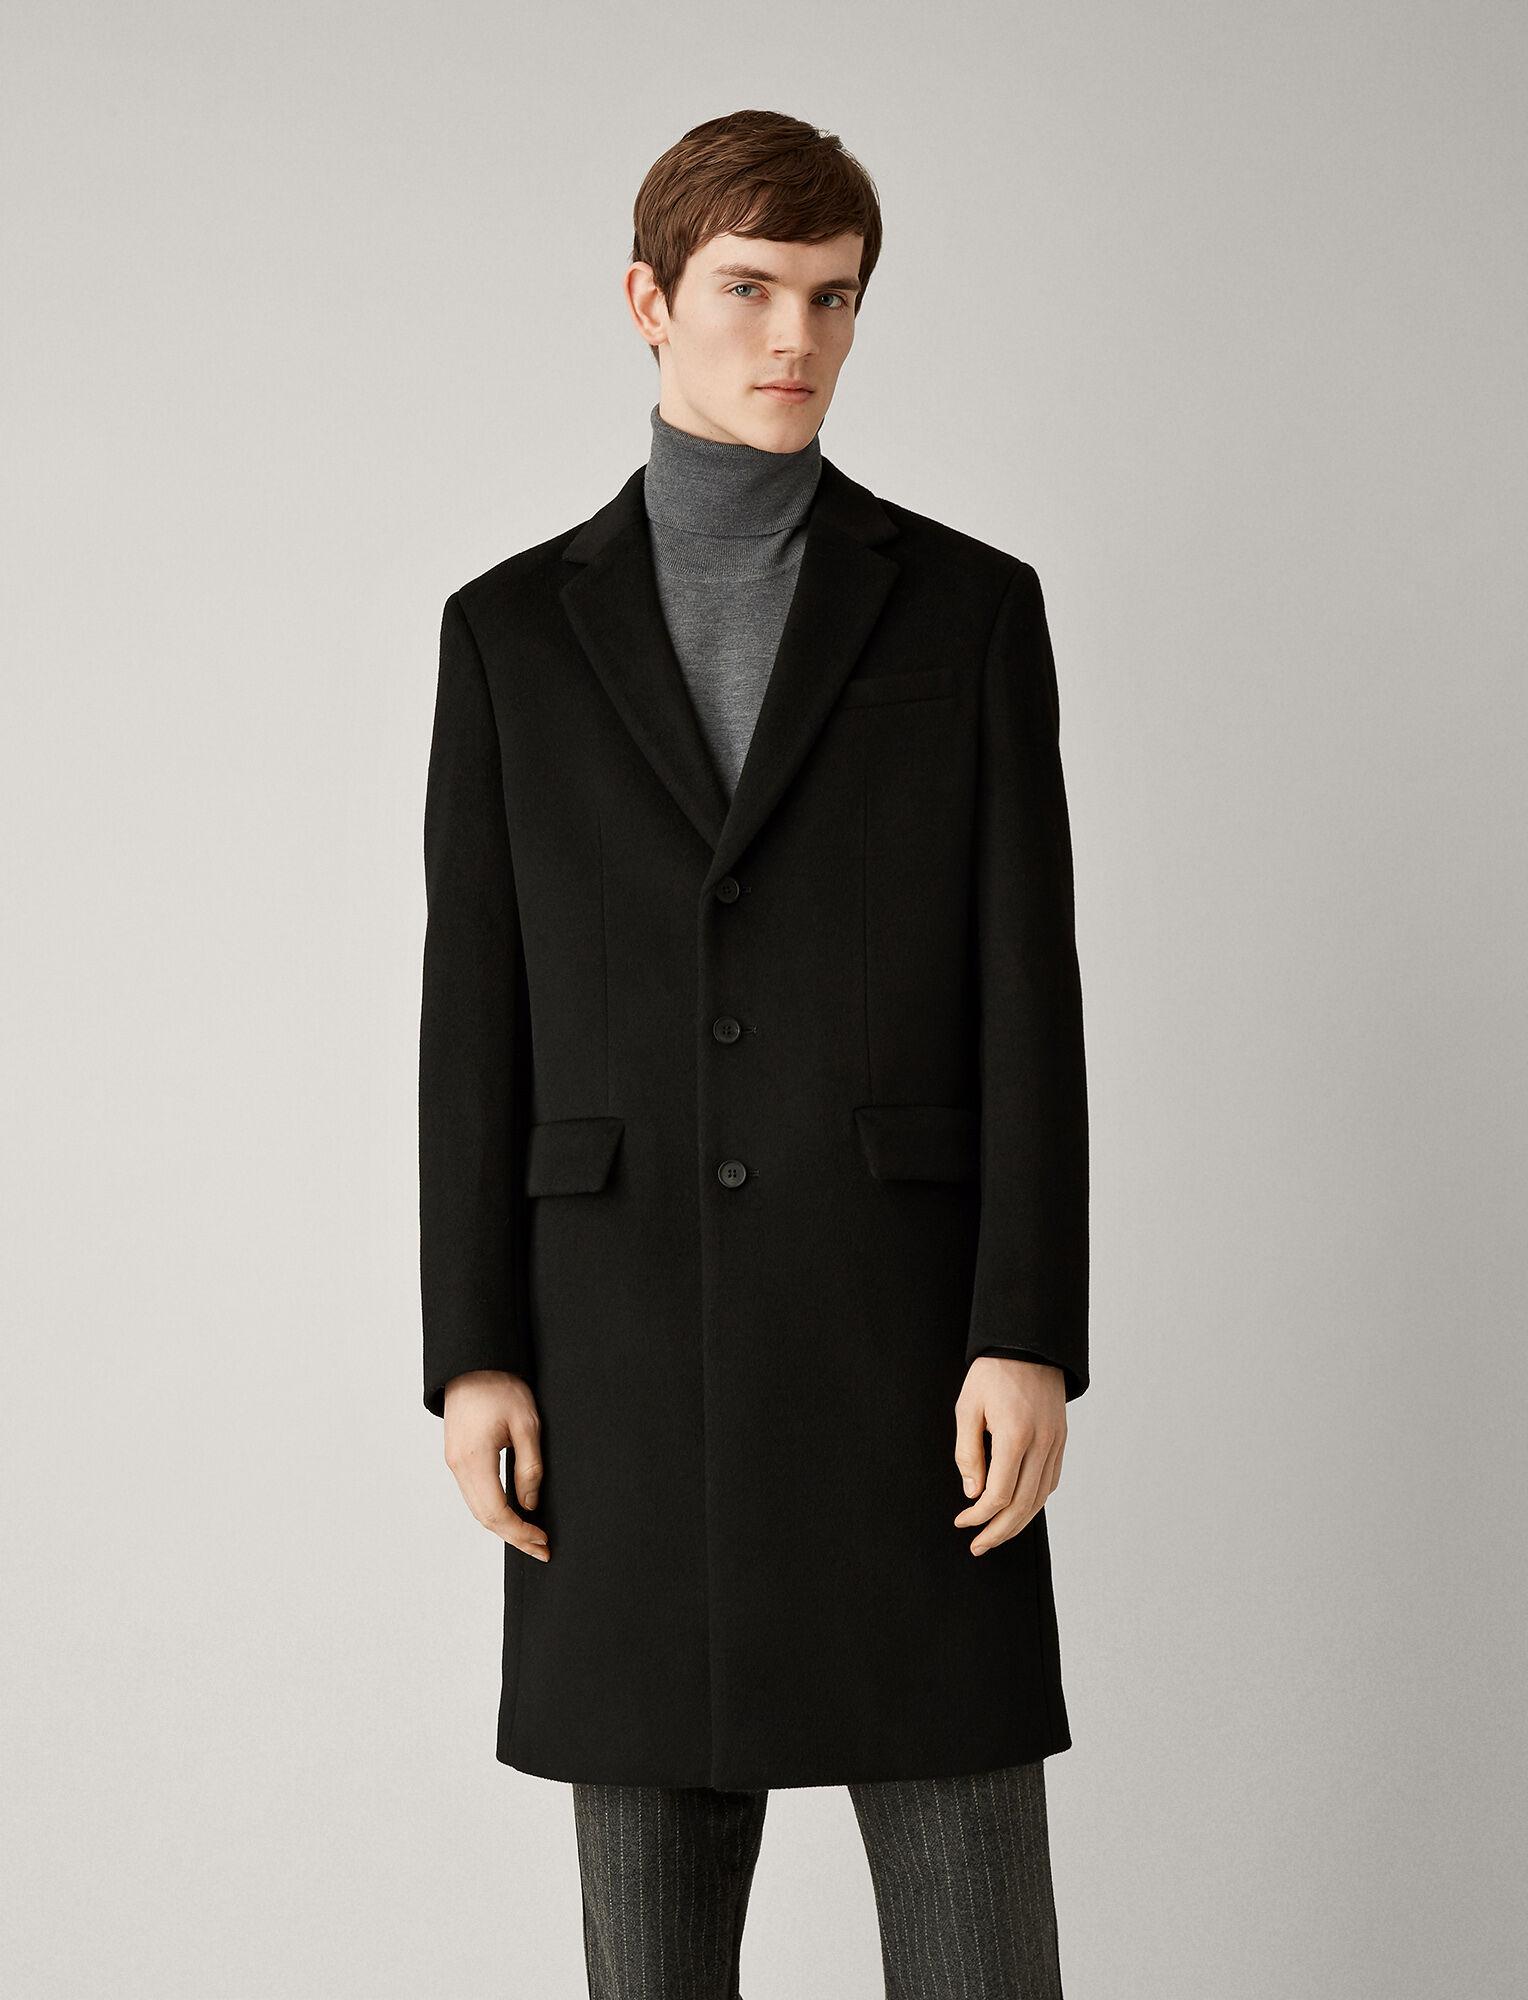 Joseph, London Wool Coat, in BLACK